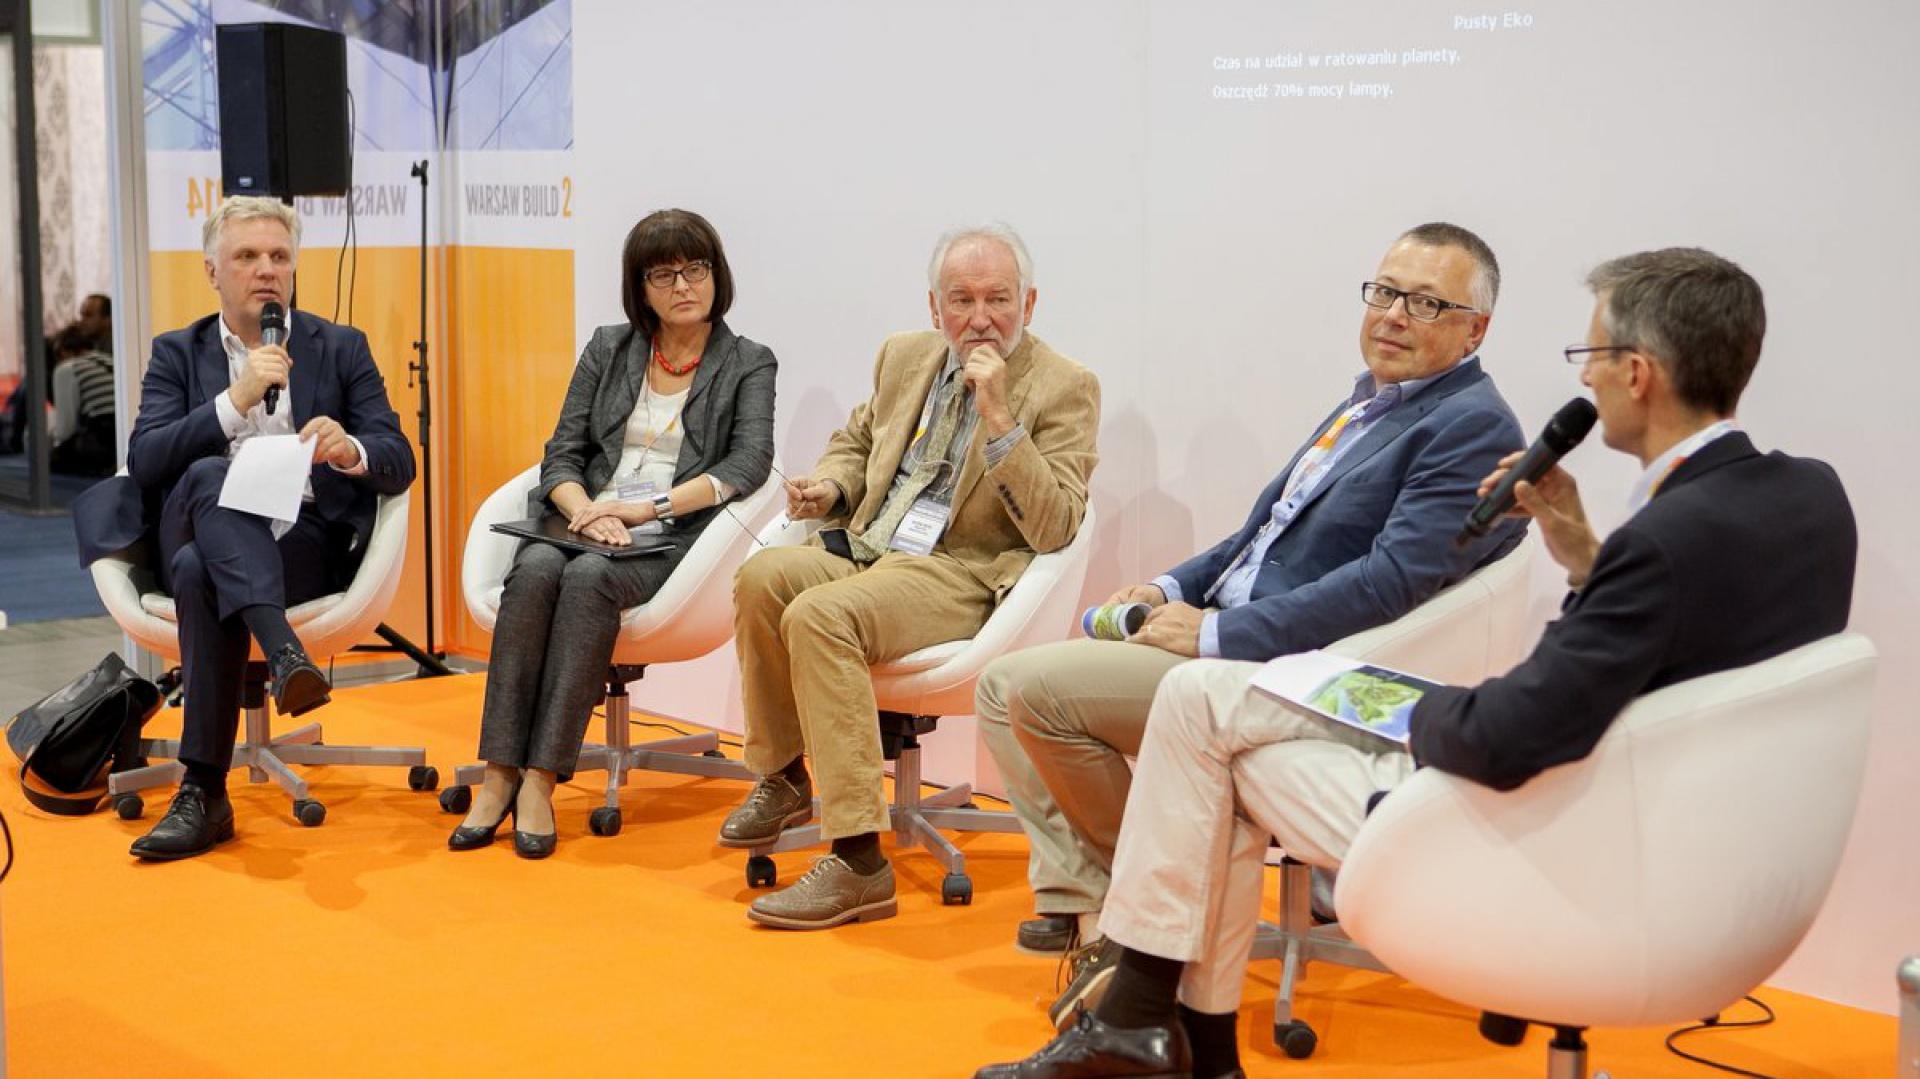 Debata ekspertów Warsaw Build 2014. Fot. Warsaw Build